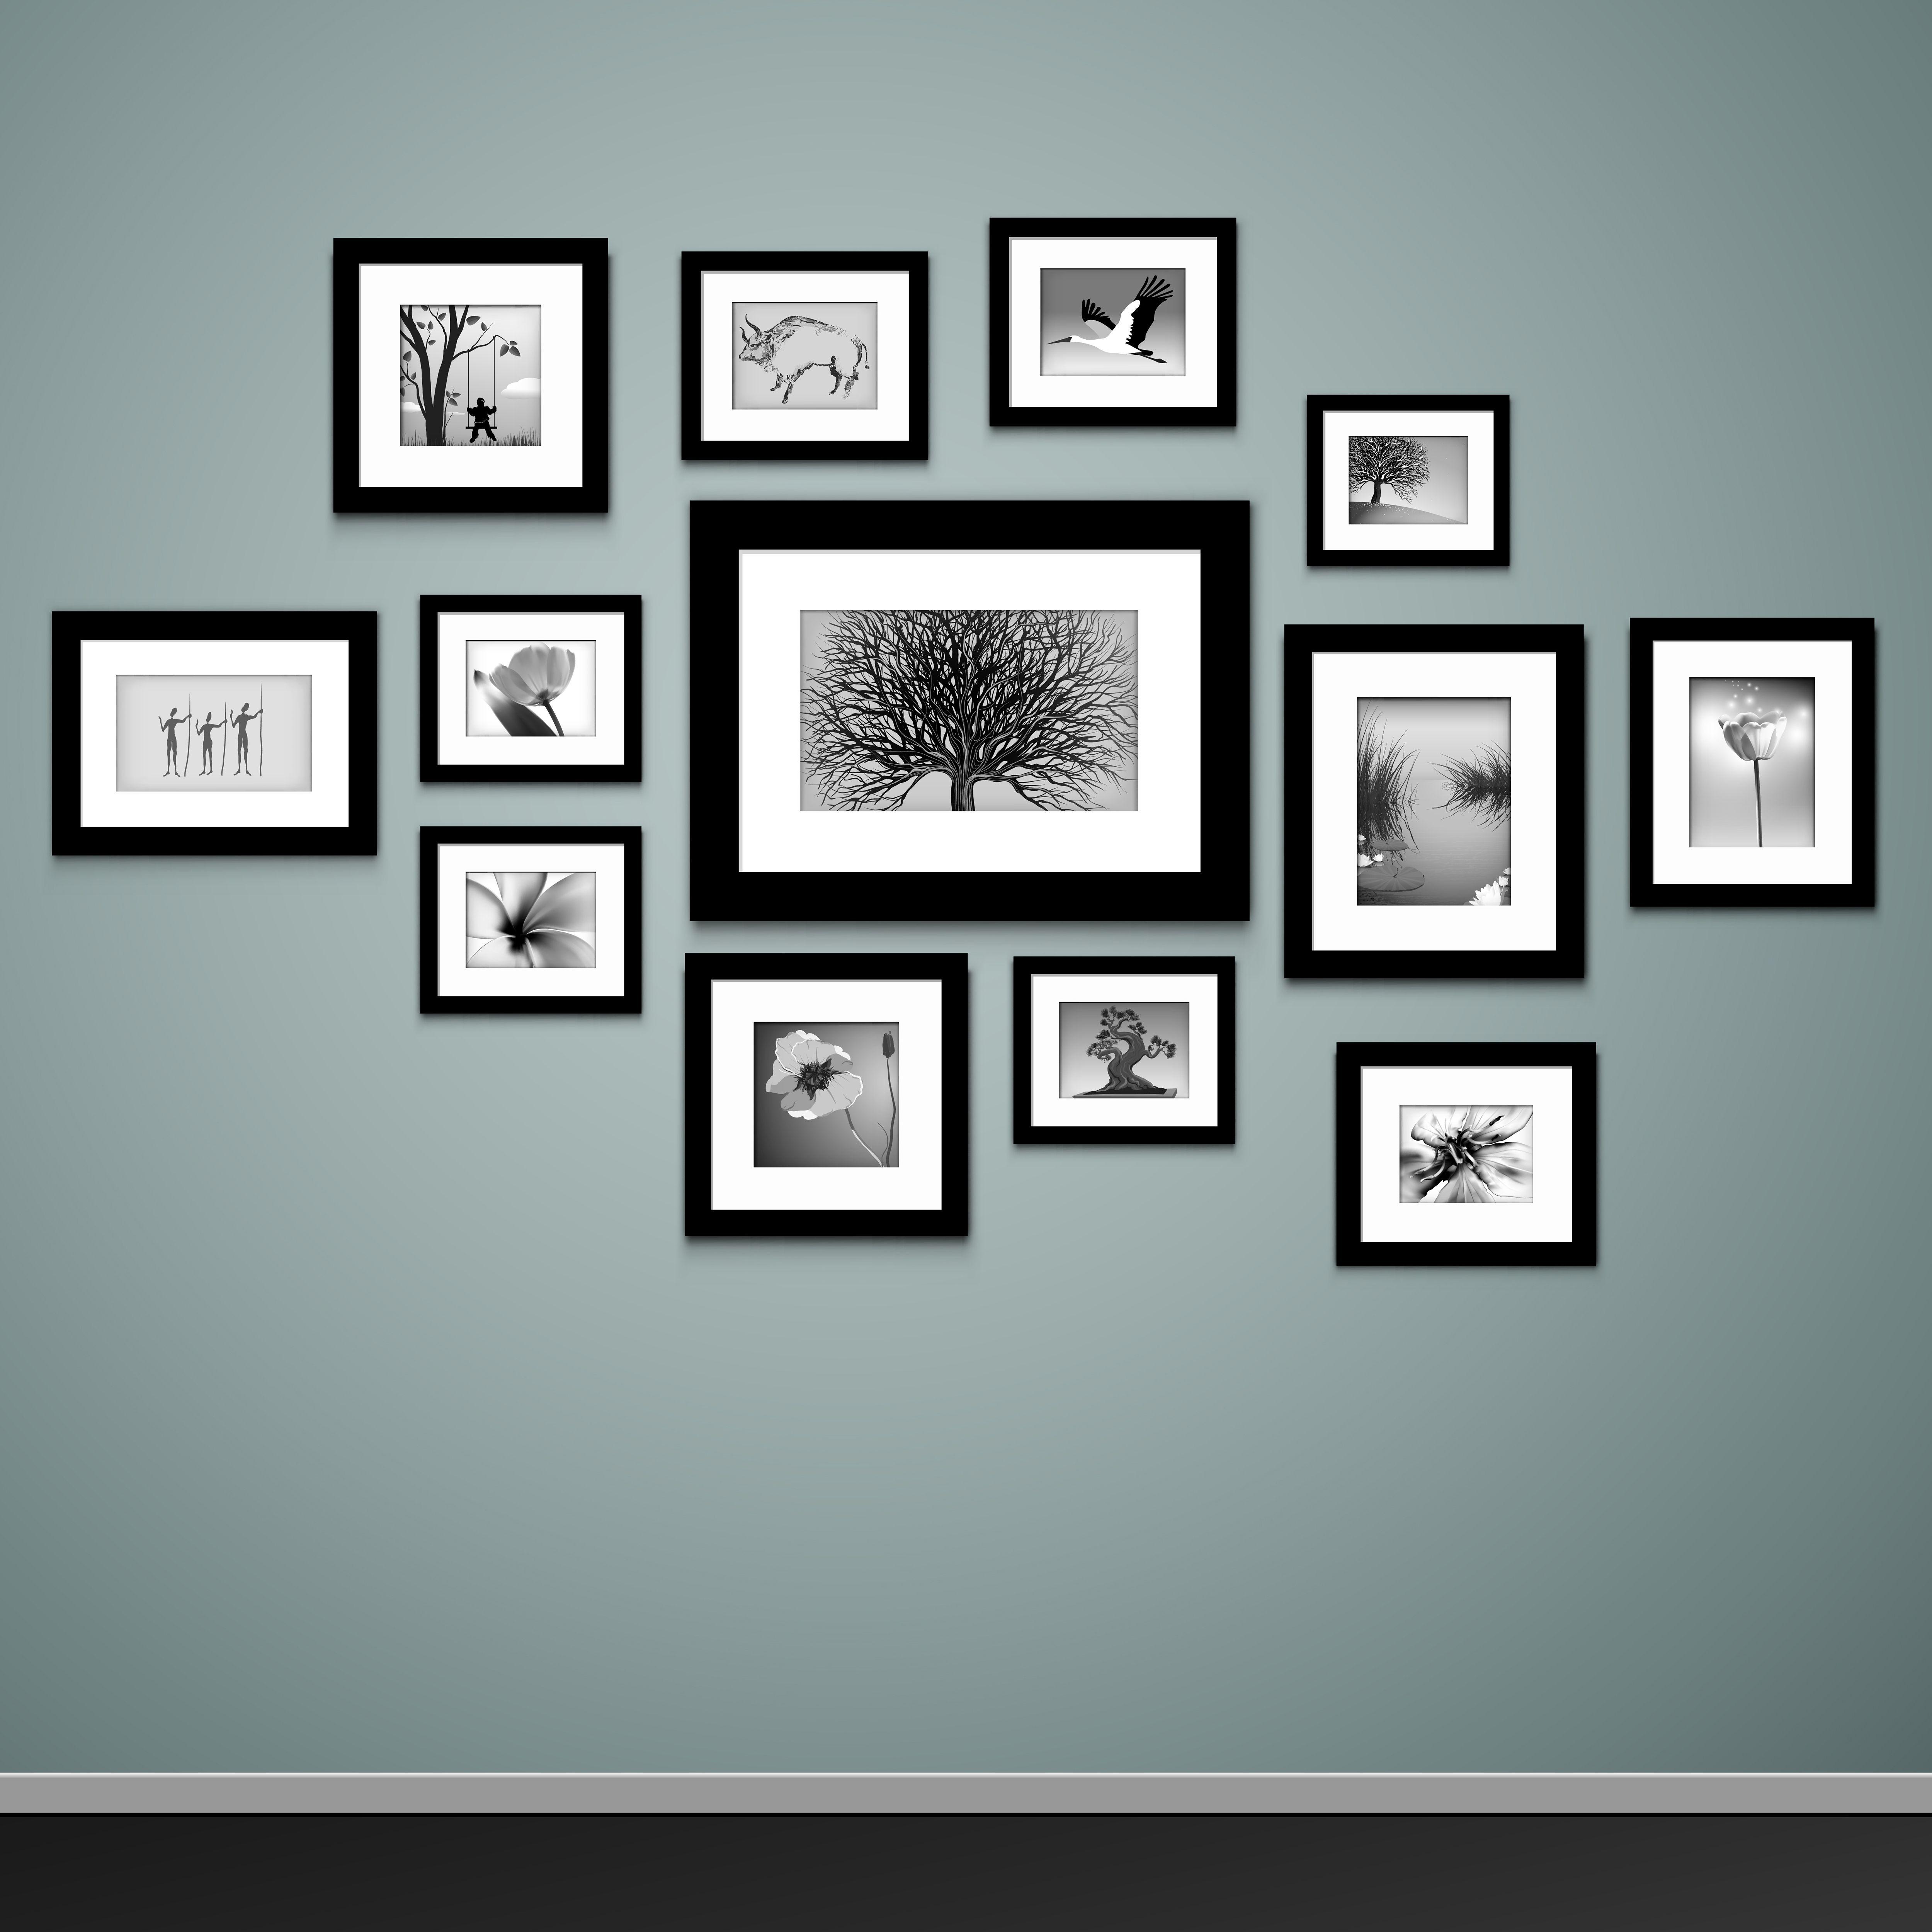 Похожее изображение Wall Frame Arrangements Picture Framing Supplies Wire Art